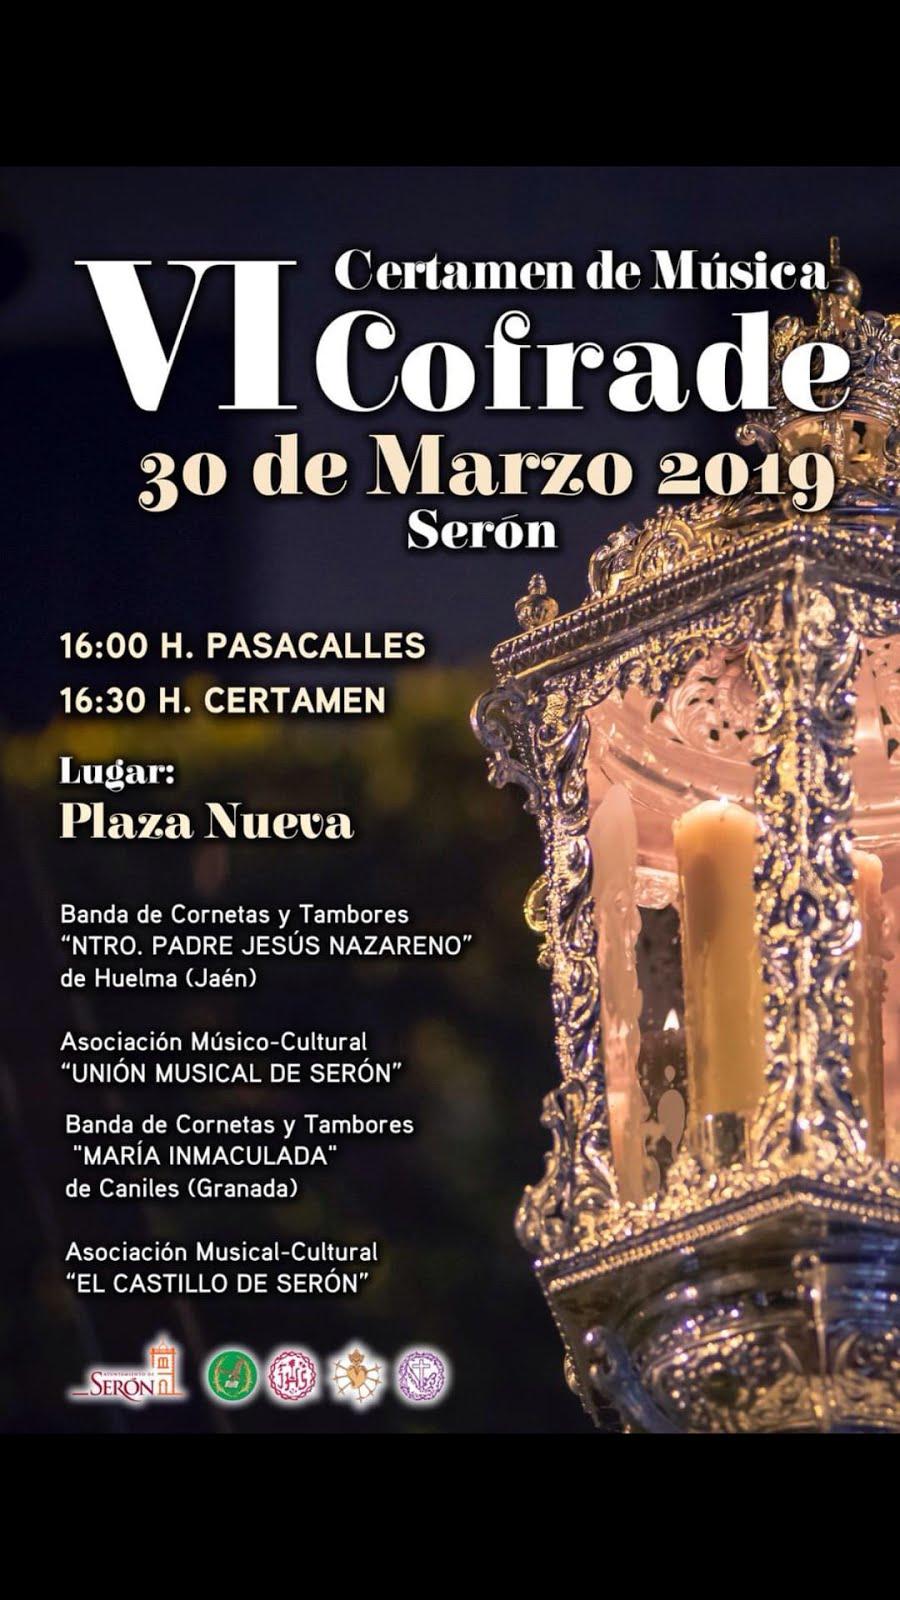 SÁBADO 30 MARZO. VI CERTAMEN MÚSICA COFRADE DE SERÓN